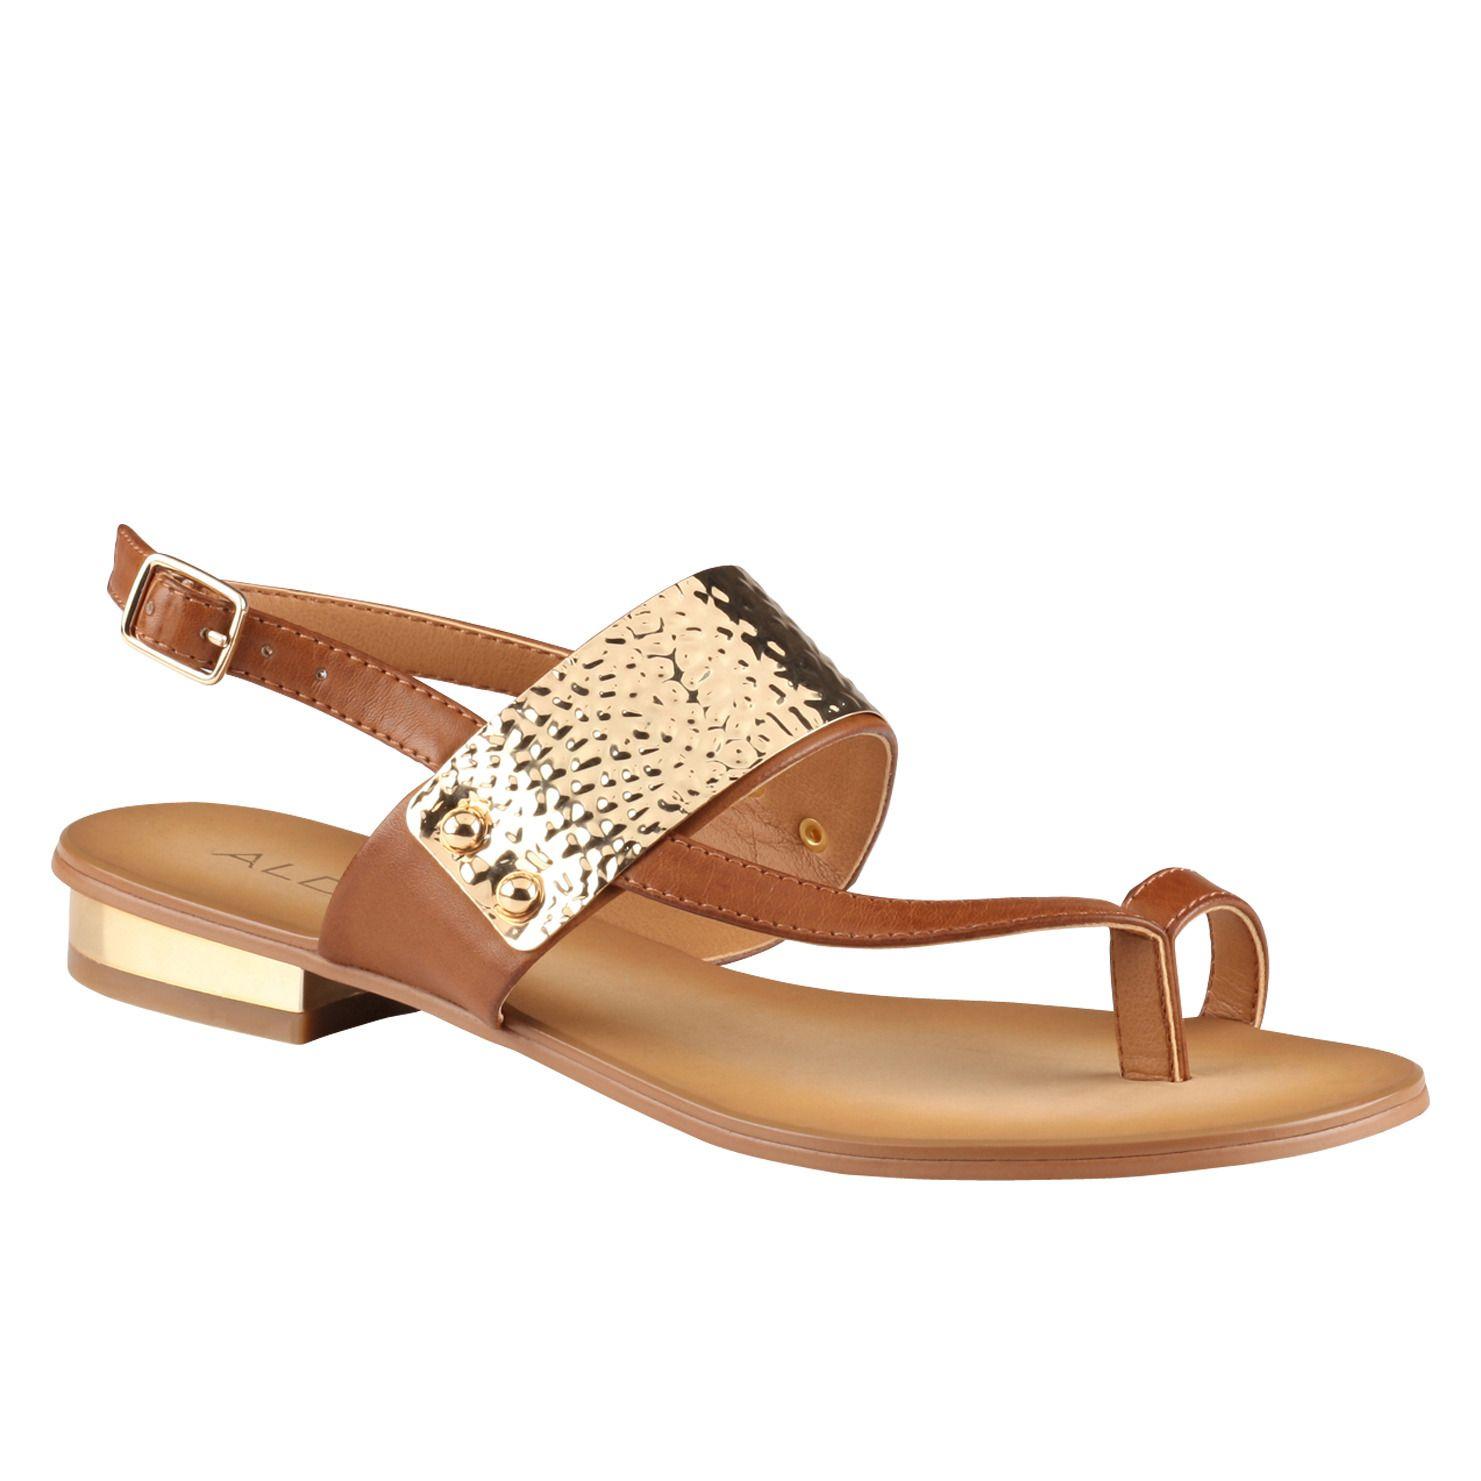 Womens sandals flat, Aldo shoes flats